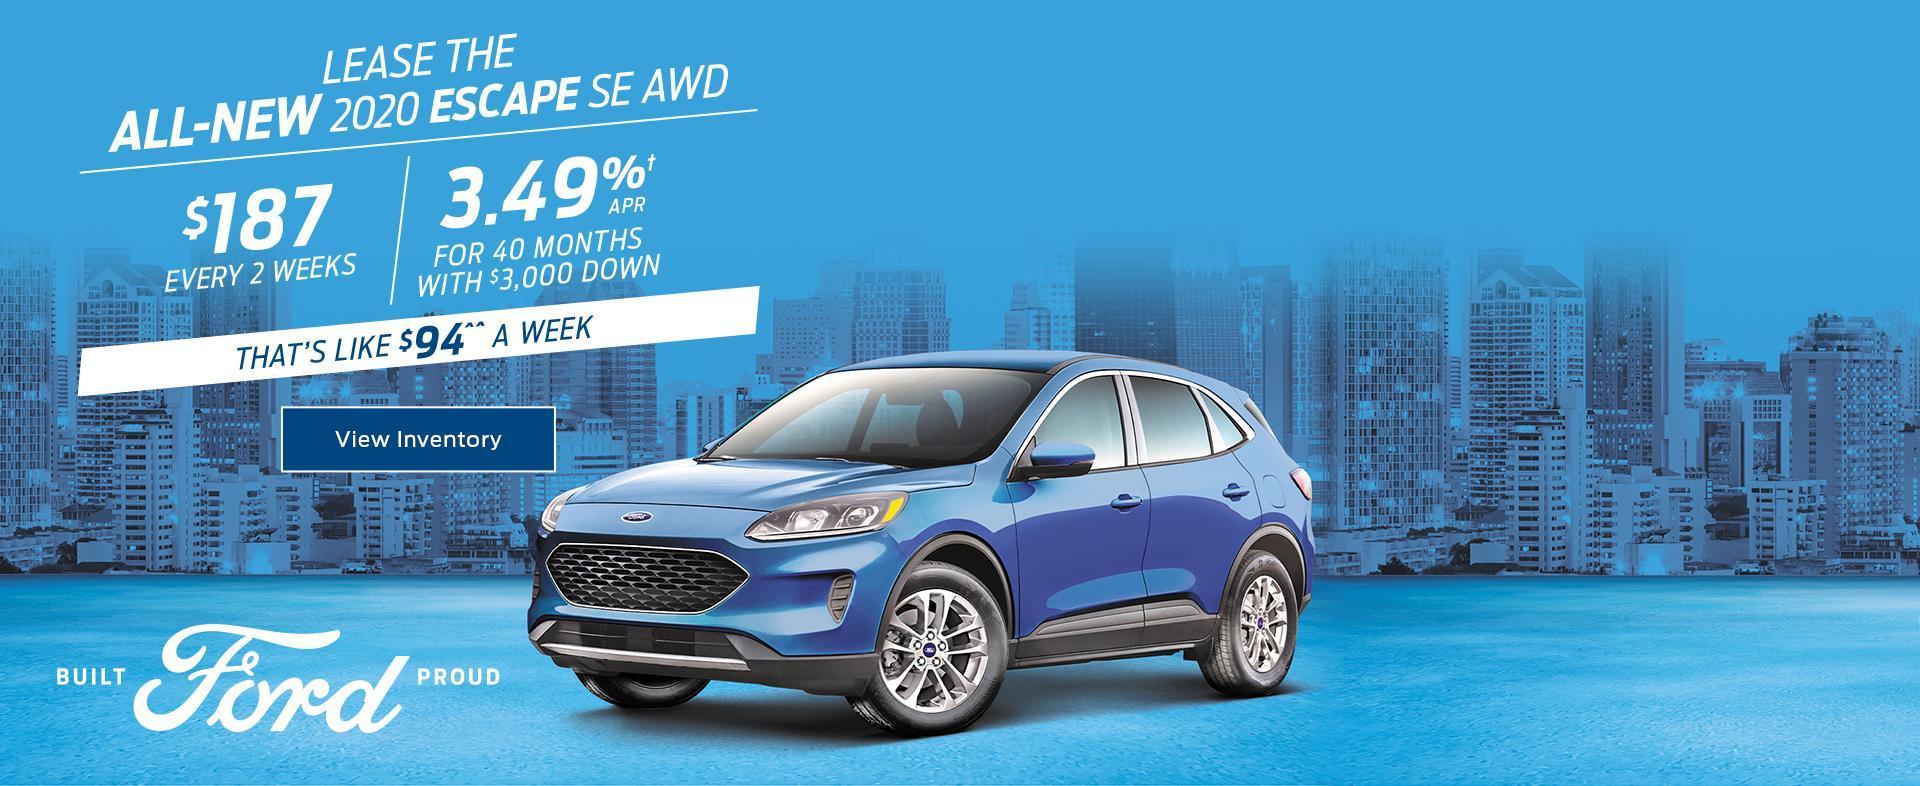 2020 Ford Escape February Lease